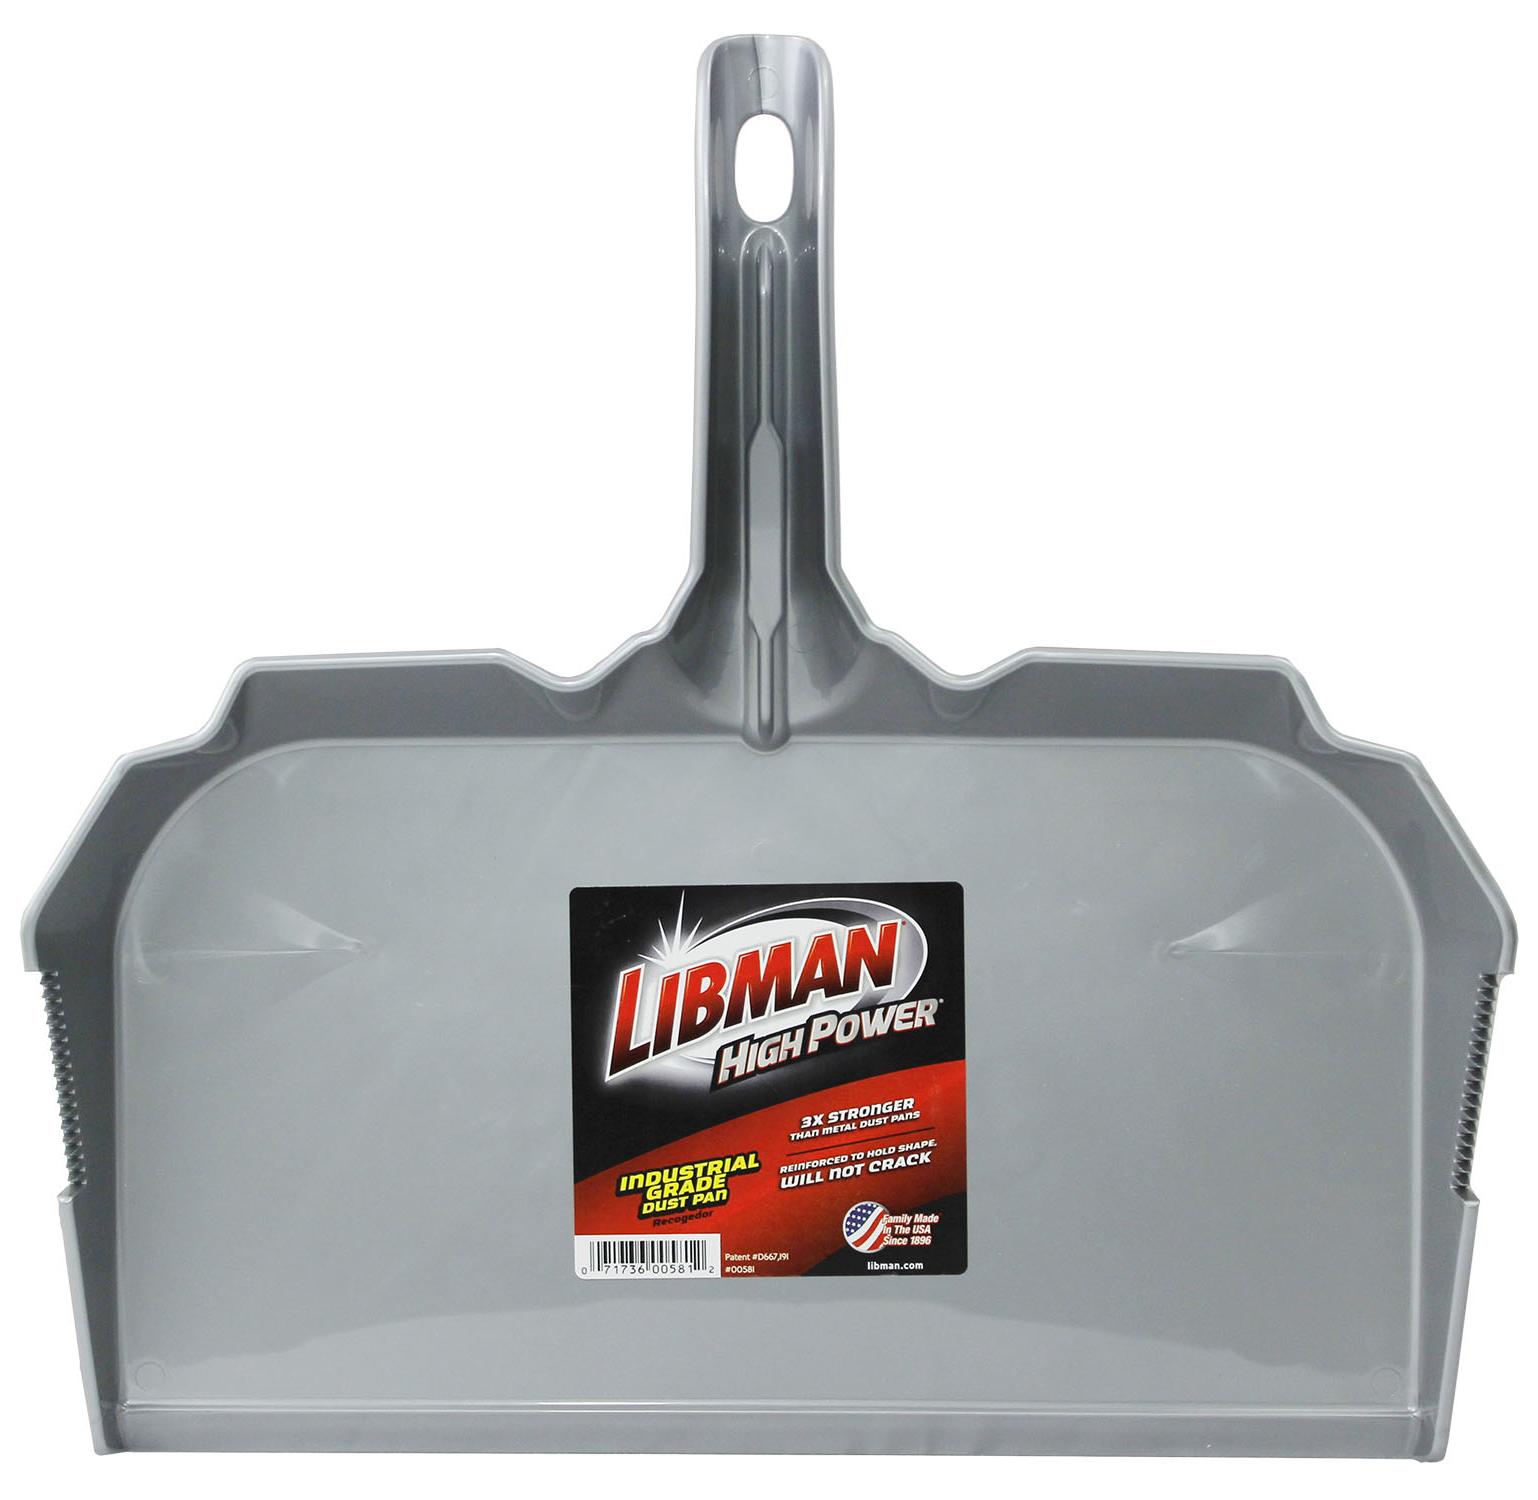 Libman 17 in. Industrial Dust Pan, Gray